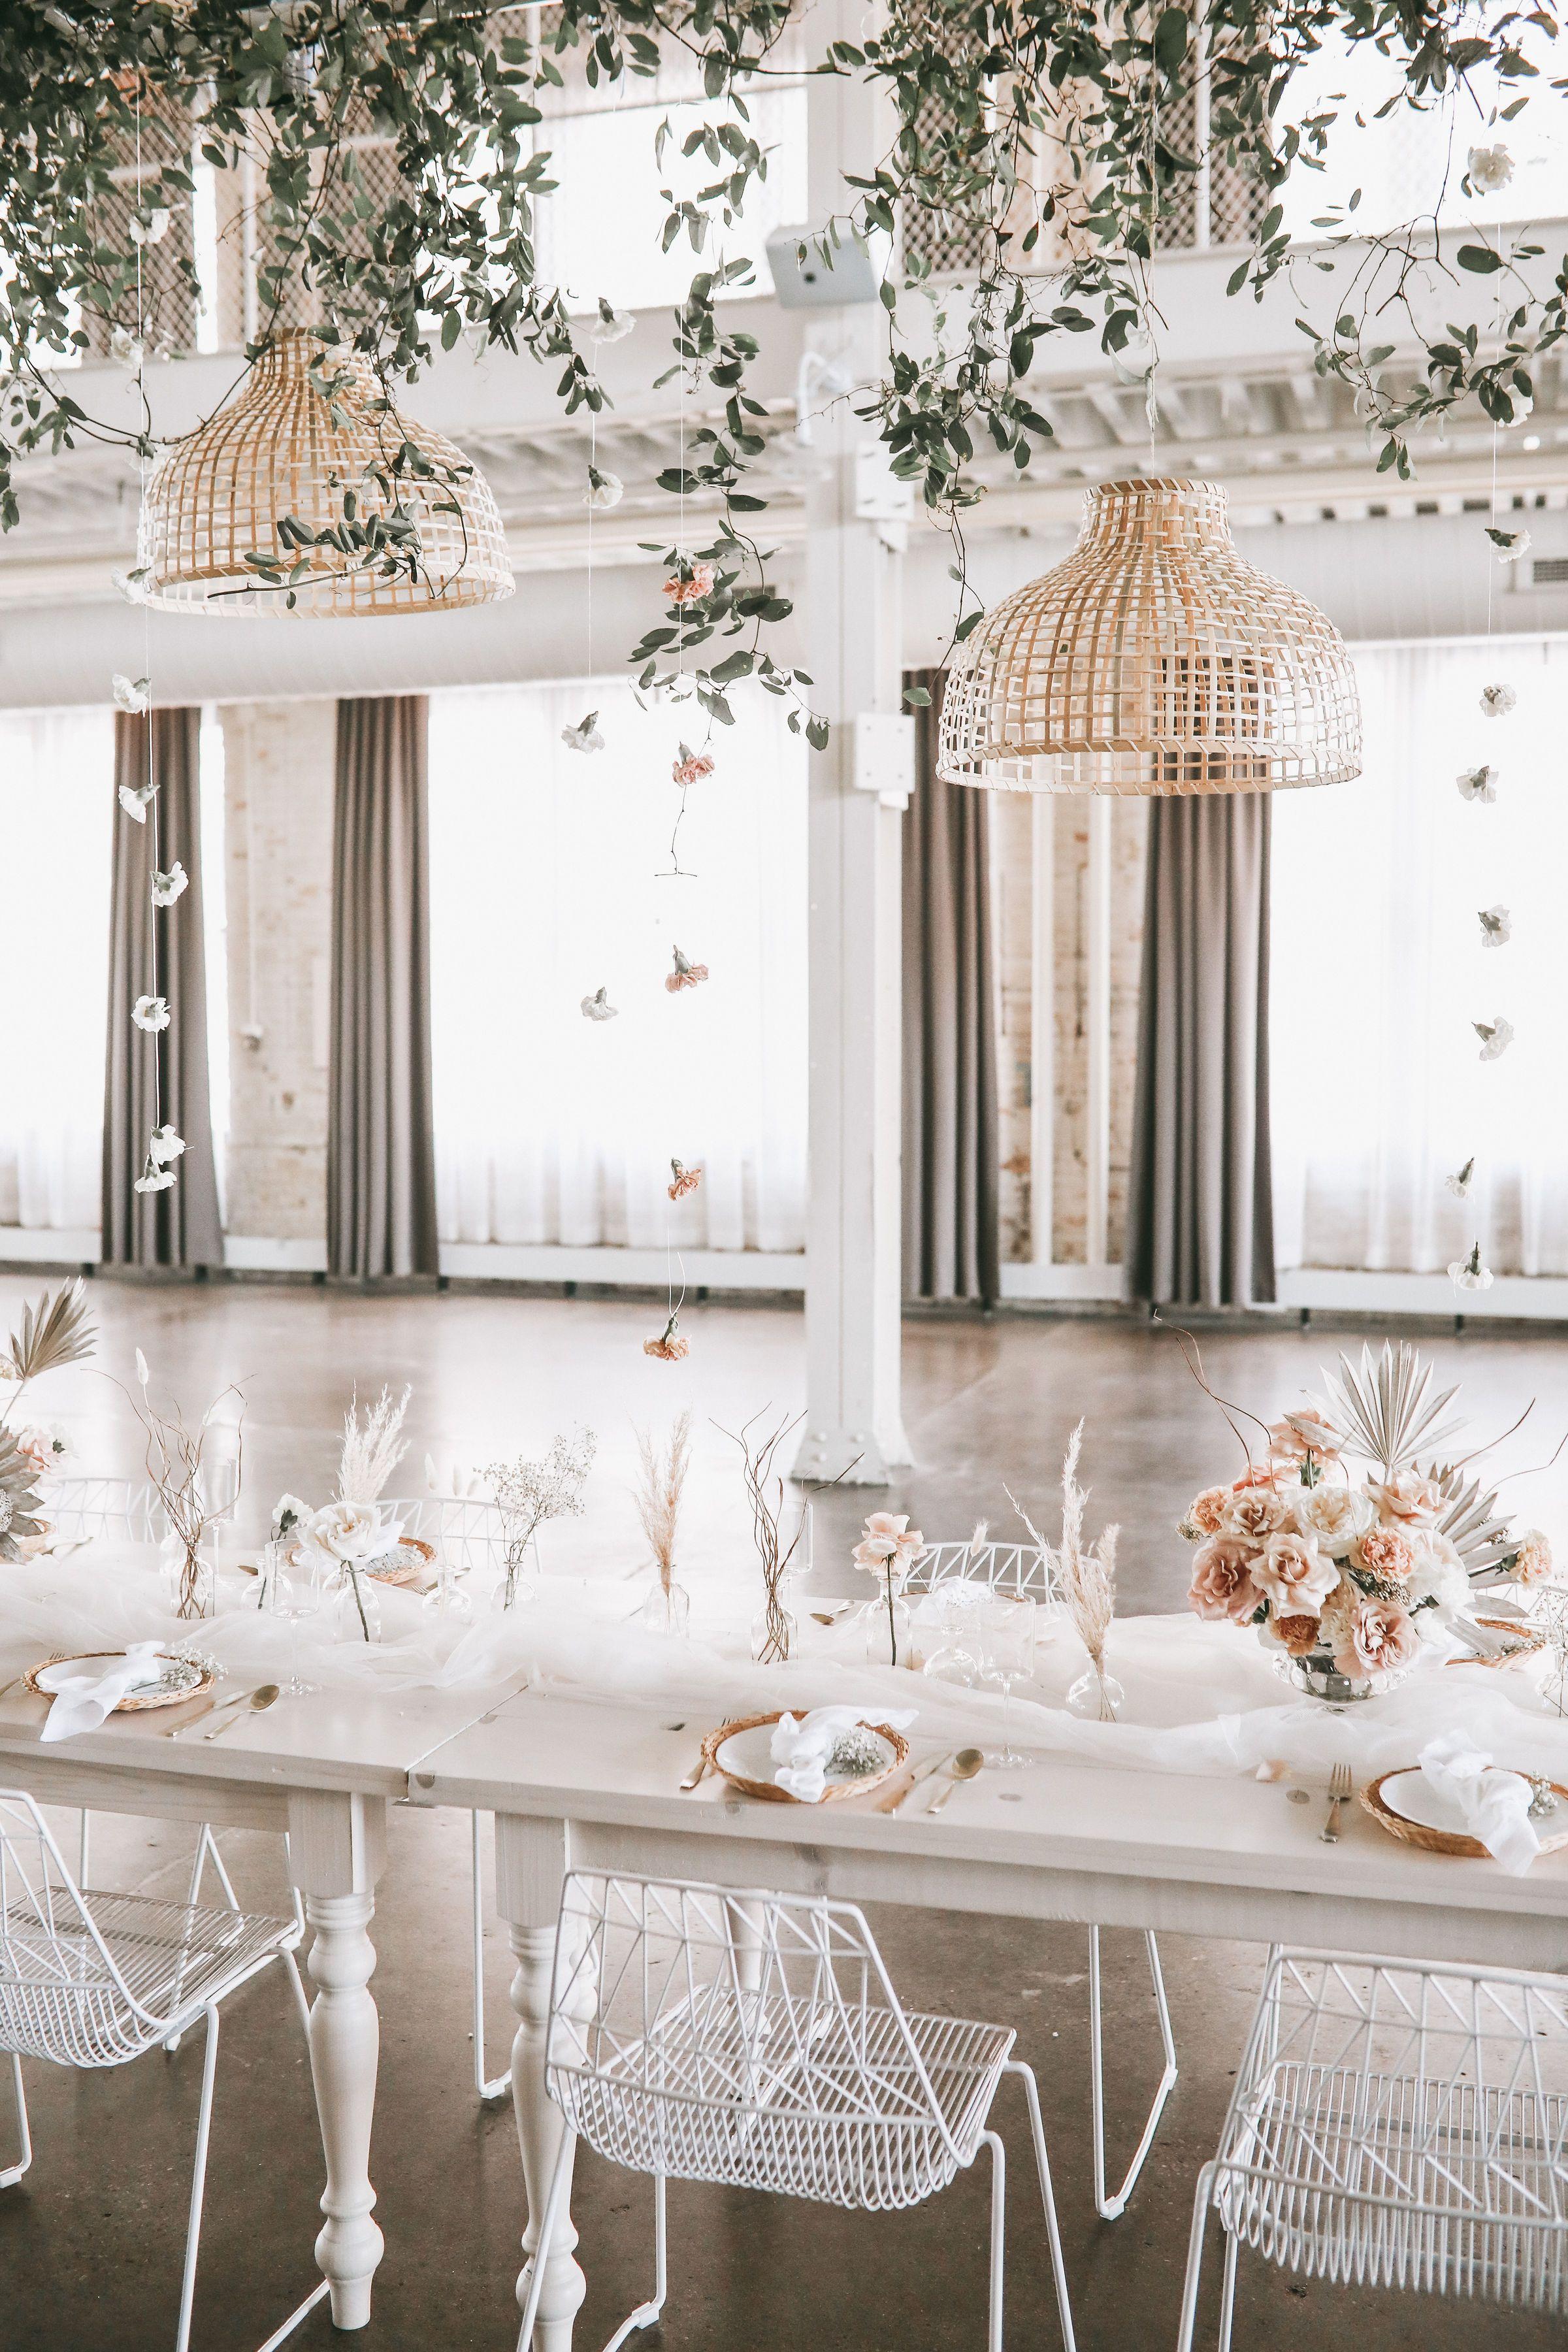 Modern bohemian wedding decor with whitewashed farm tables